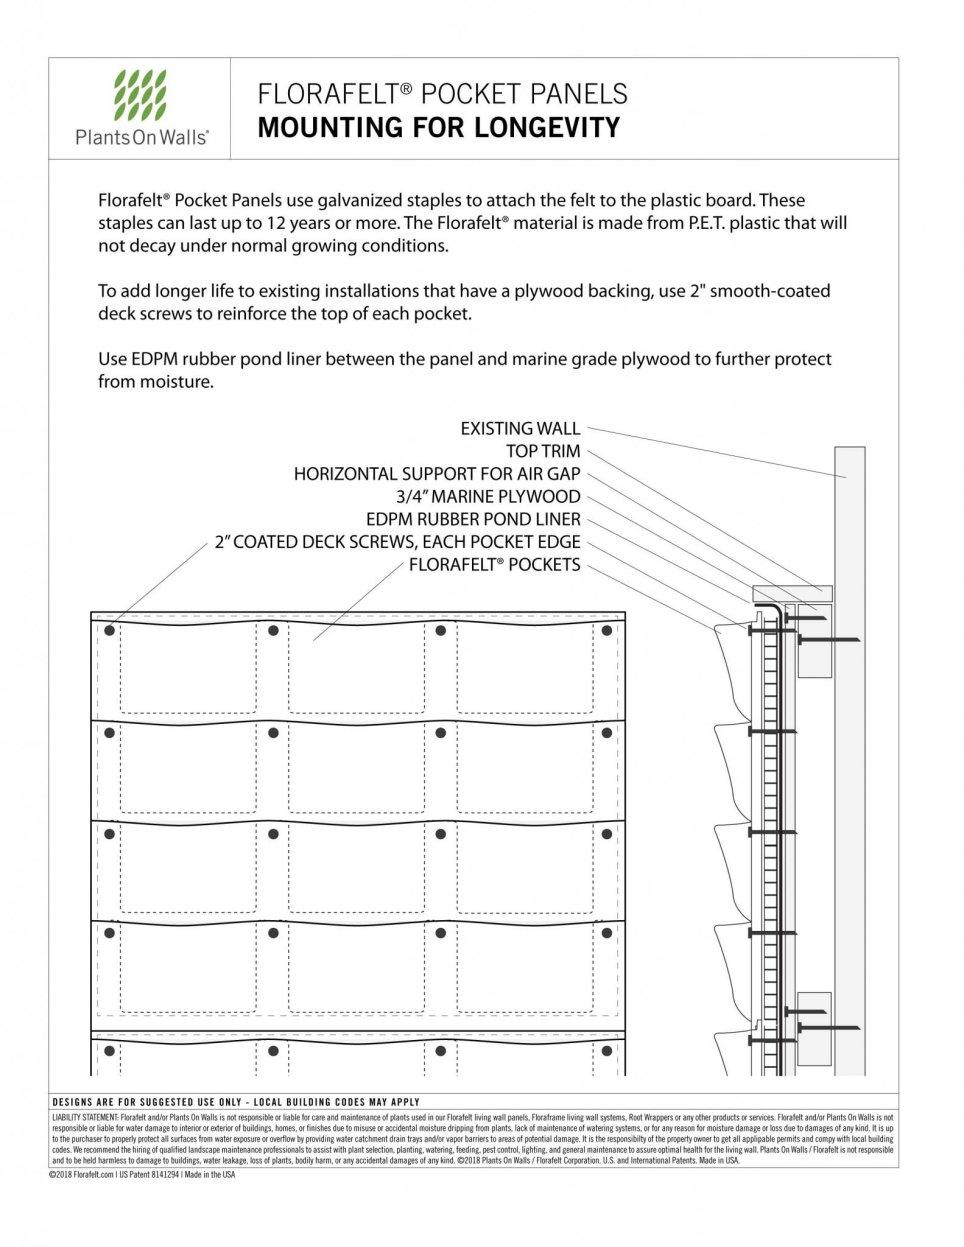 Florafelt® Pocket Panels: Mounting for Longevity